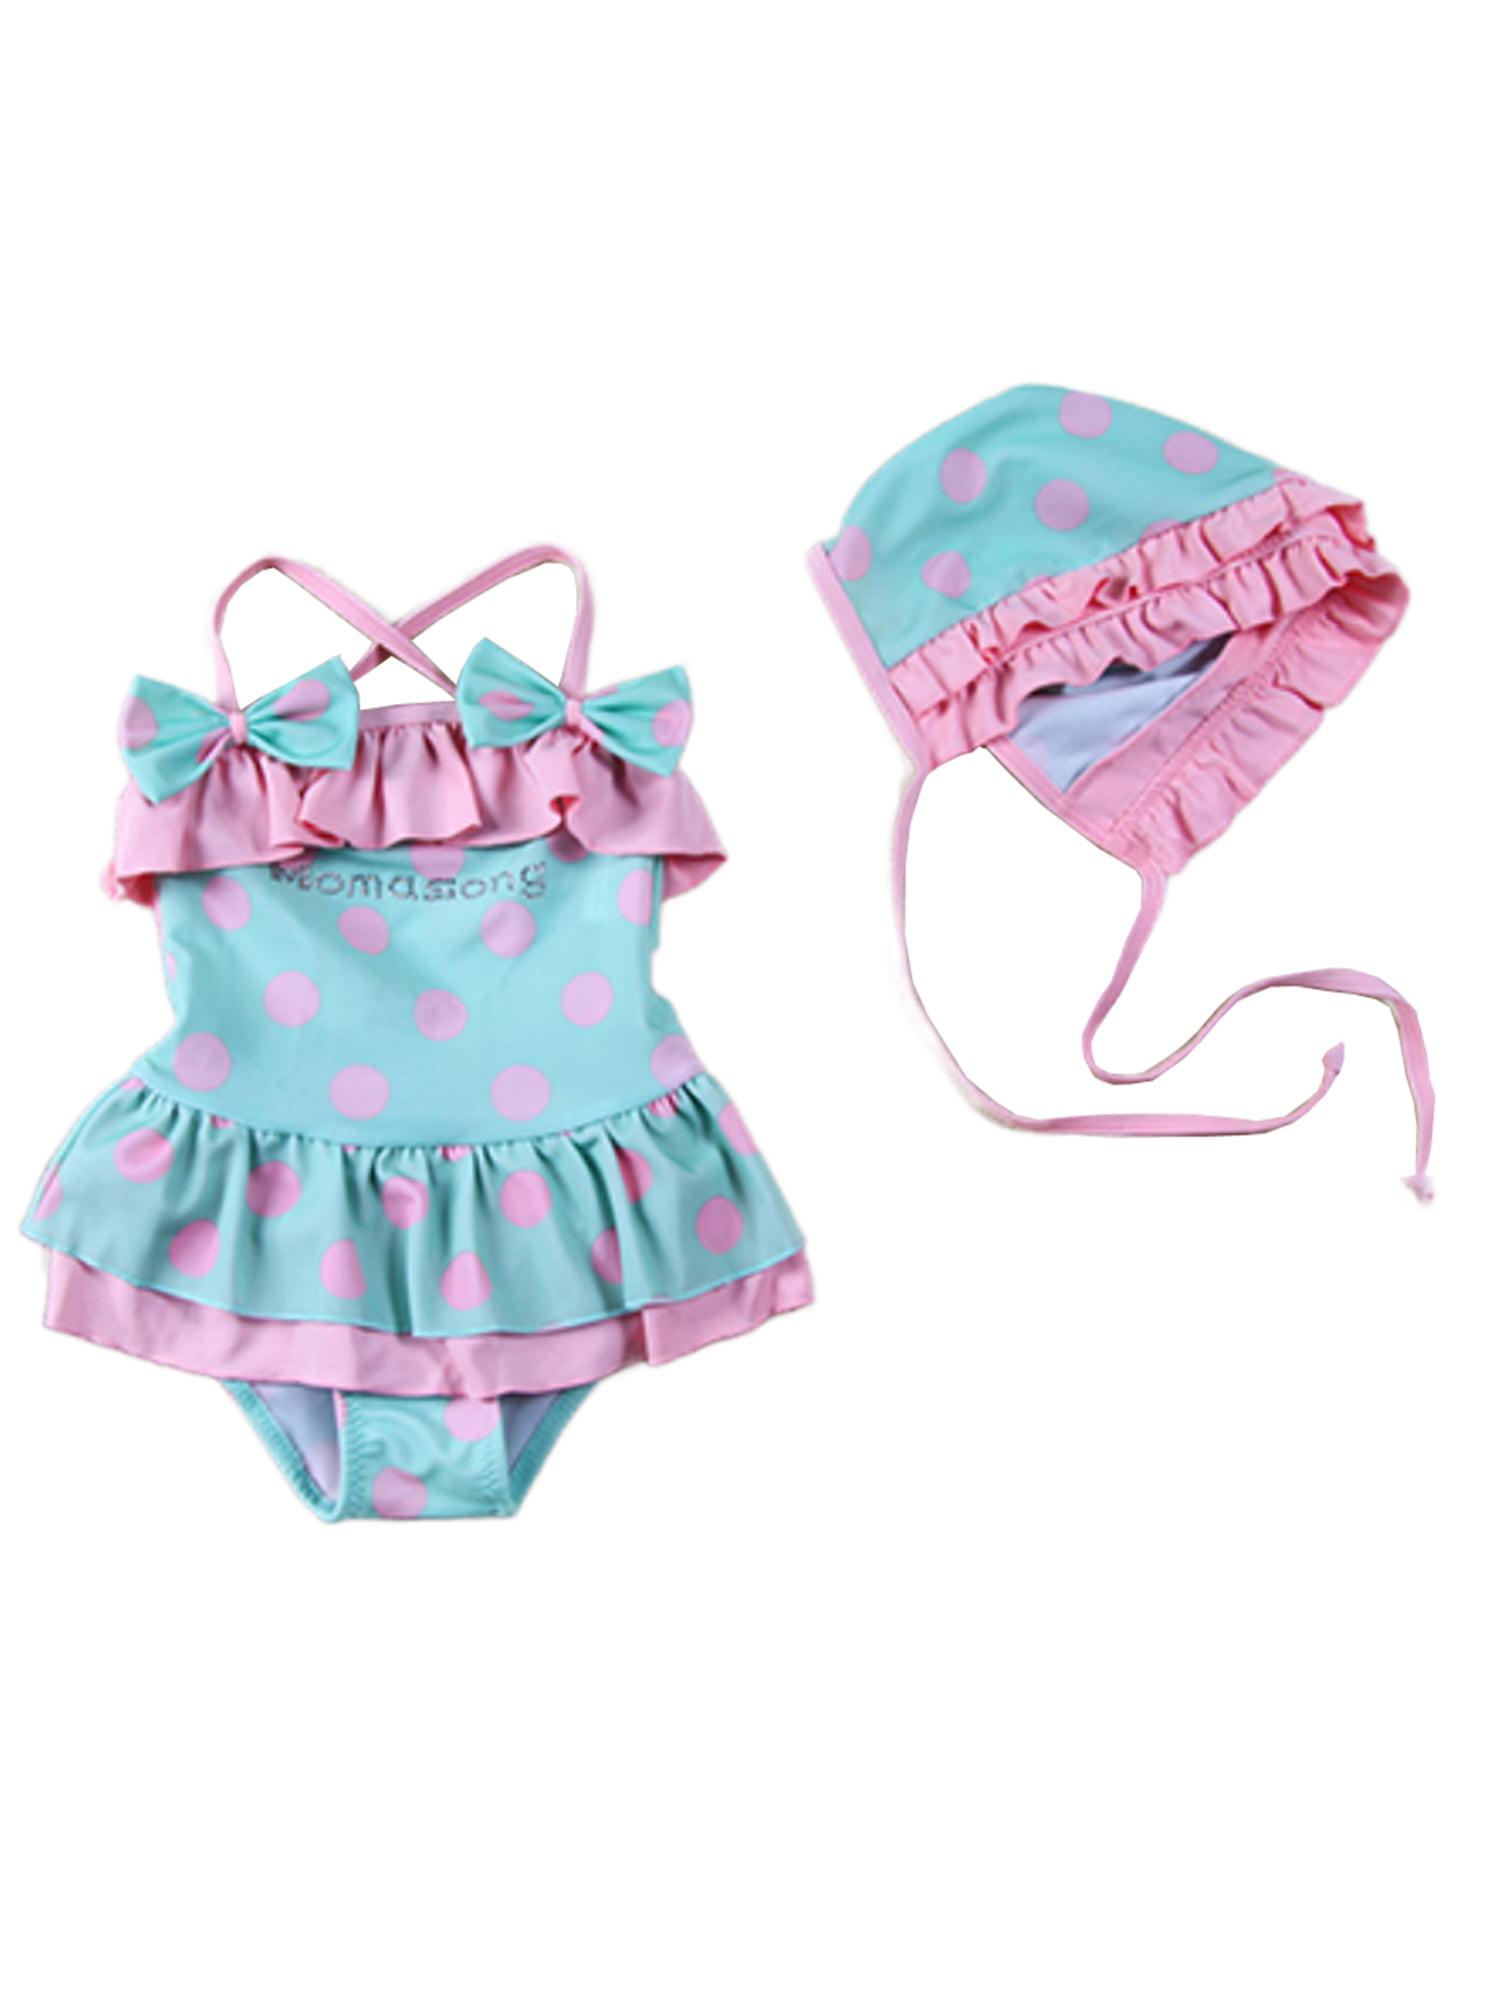 StylesILove Beach Girls Polka Dot Bow Swimsuit 2-piece (1-2 Years)